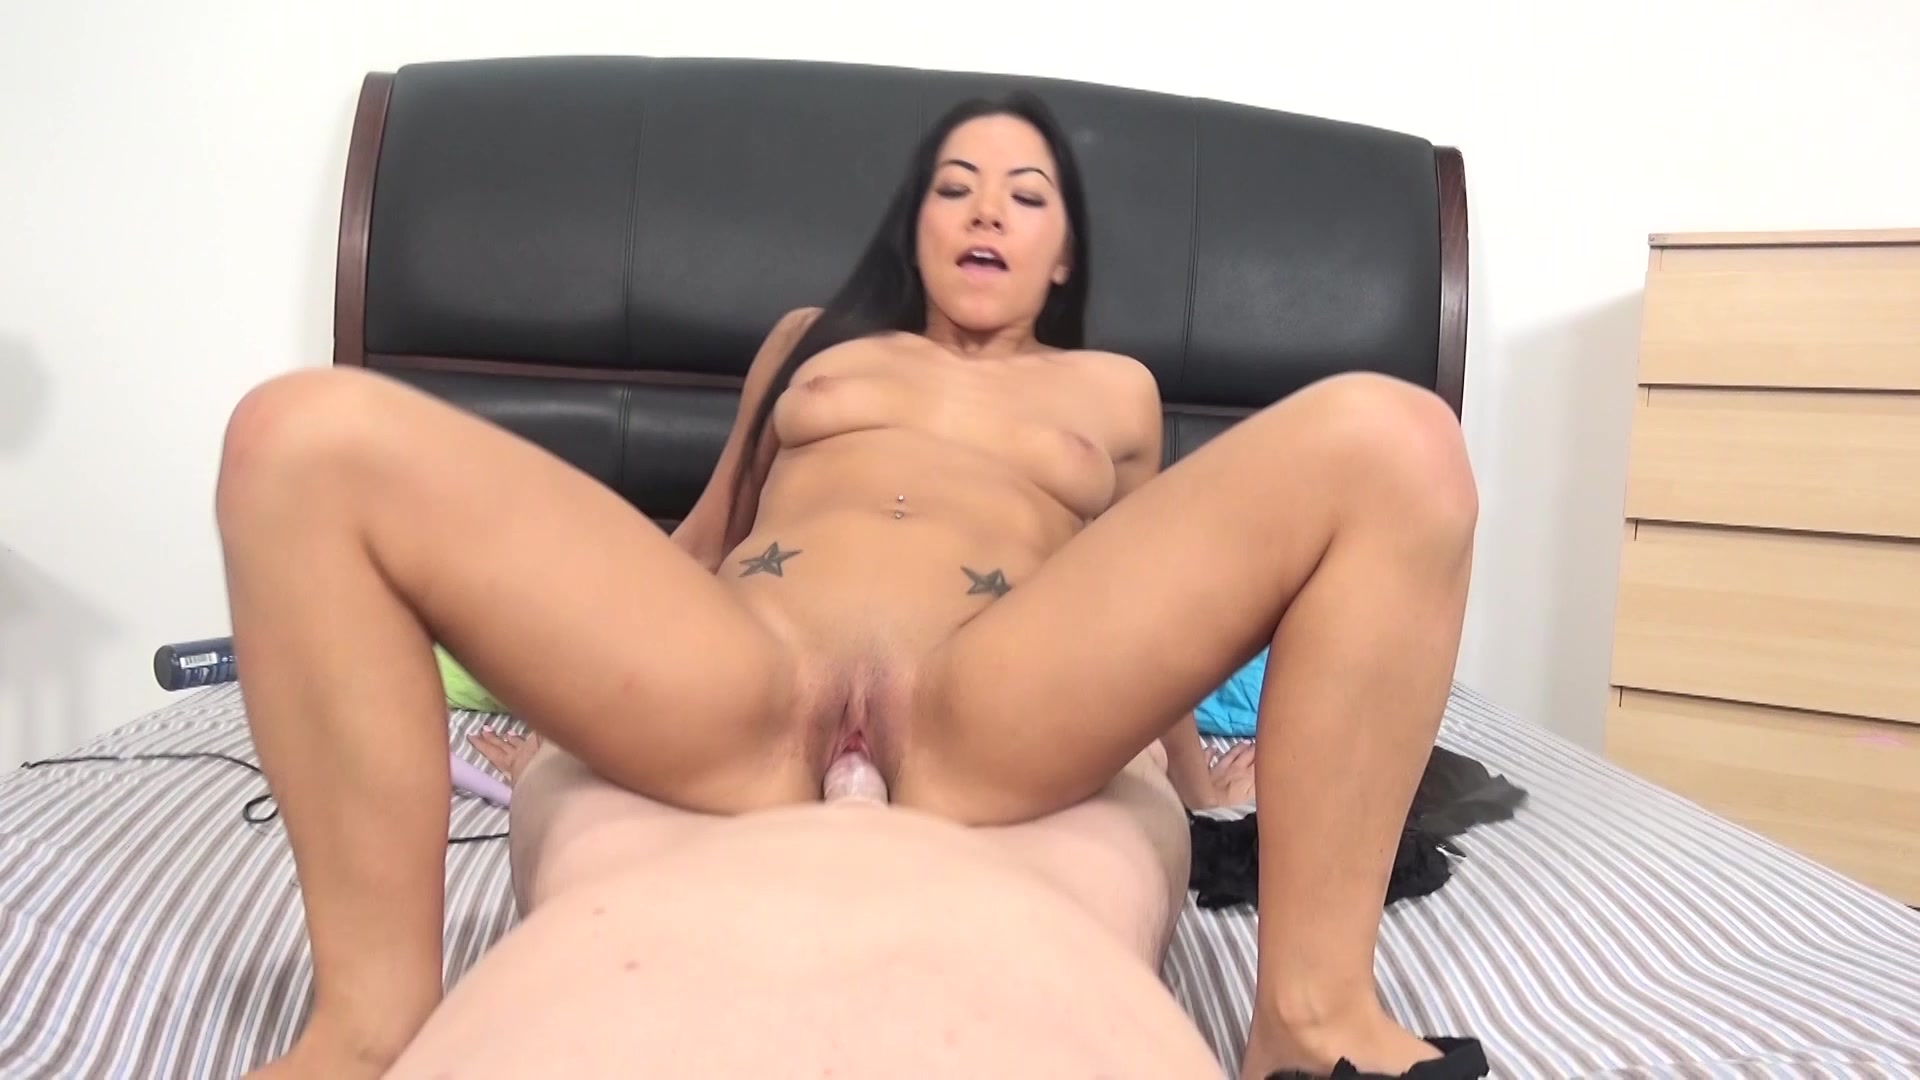 Hd Asian Porn Free